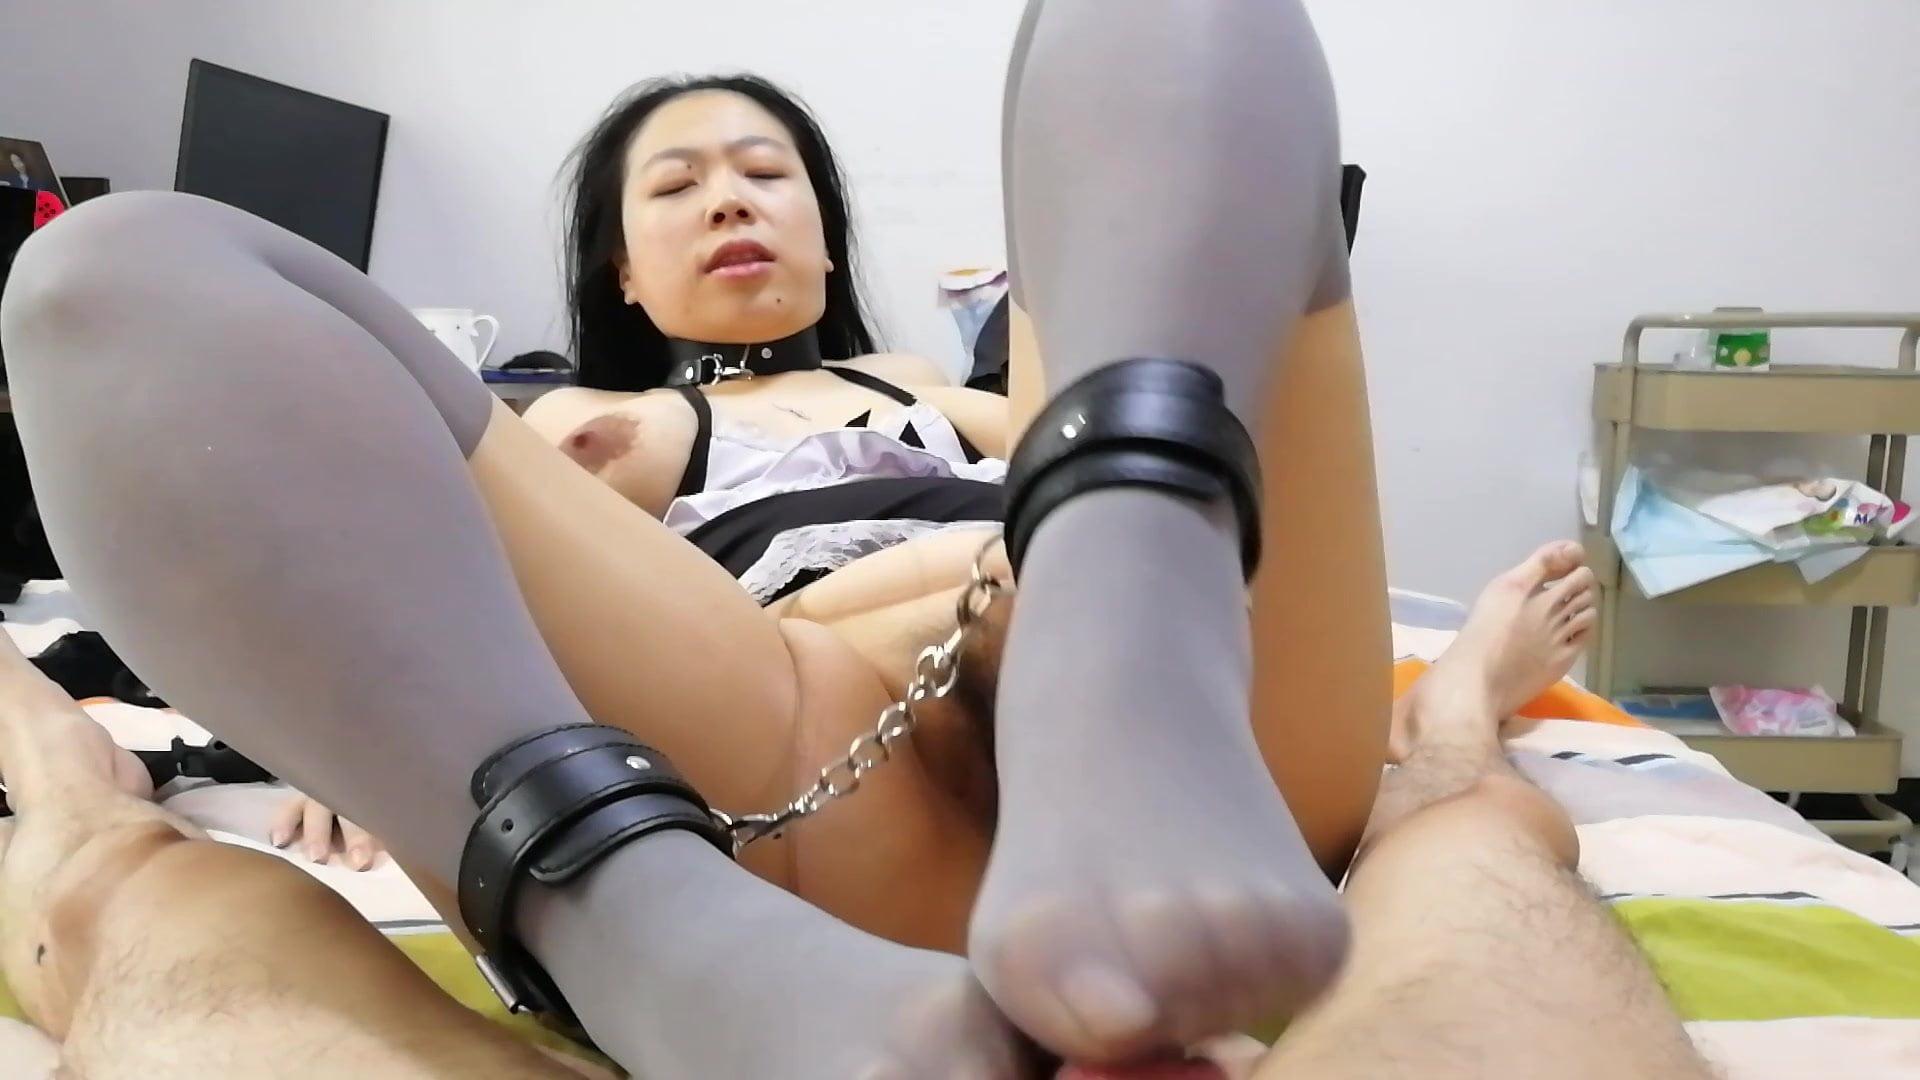 Asian Insert Heels Porn asian chinese slut in hotel - asian hotel, asian slut, slut